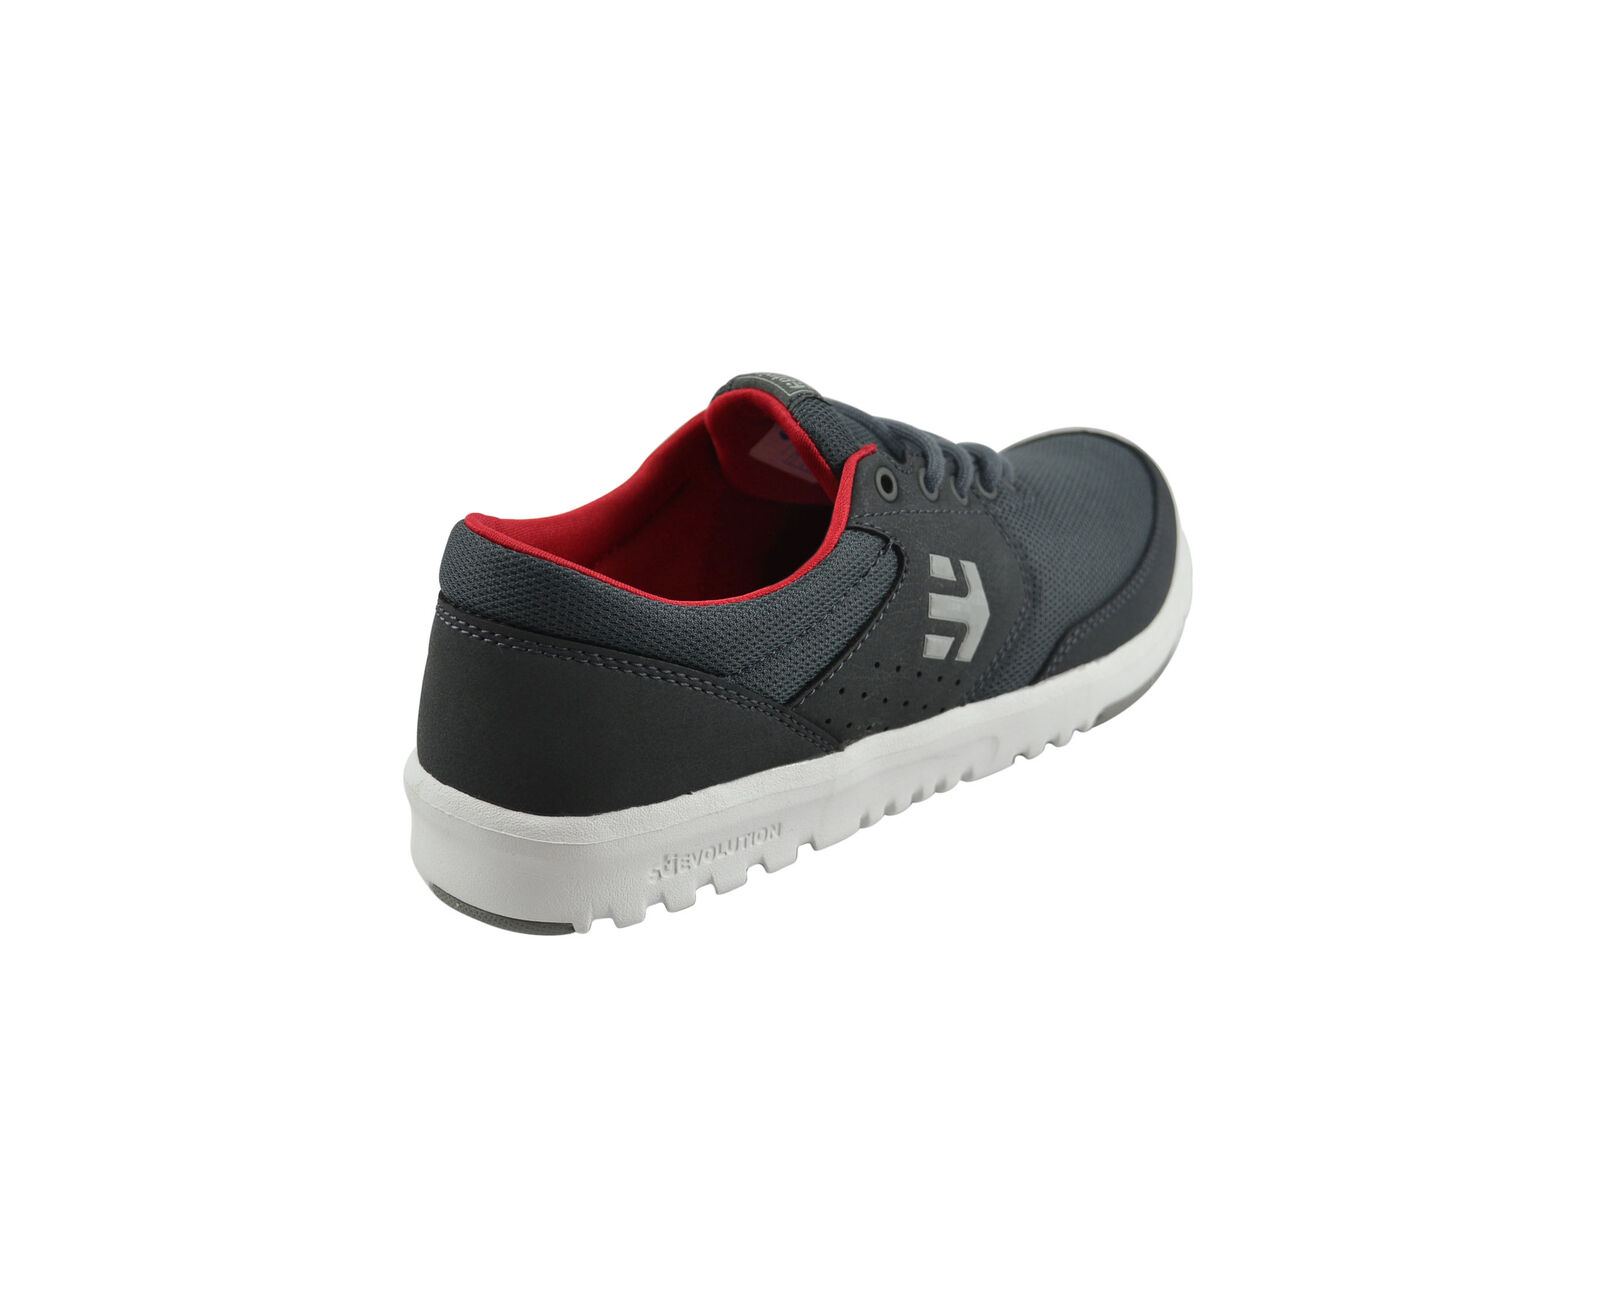 Etnies Etnies Etnies Marana SC Grau/Weiß/gum Skater Turnschuhe/Schuhe grau 55531d